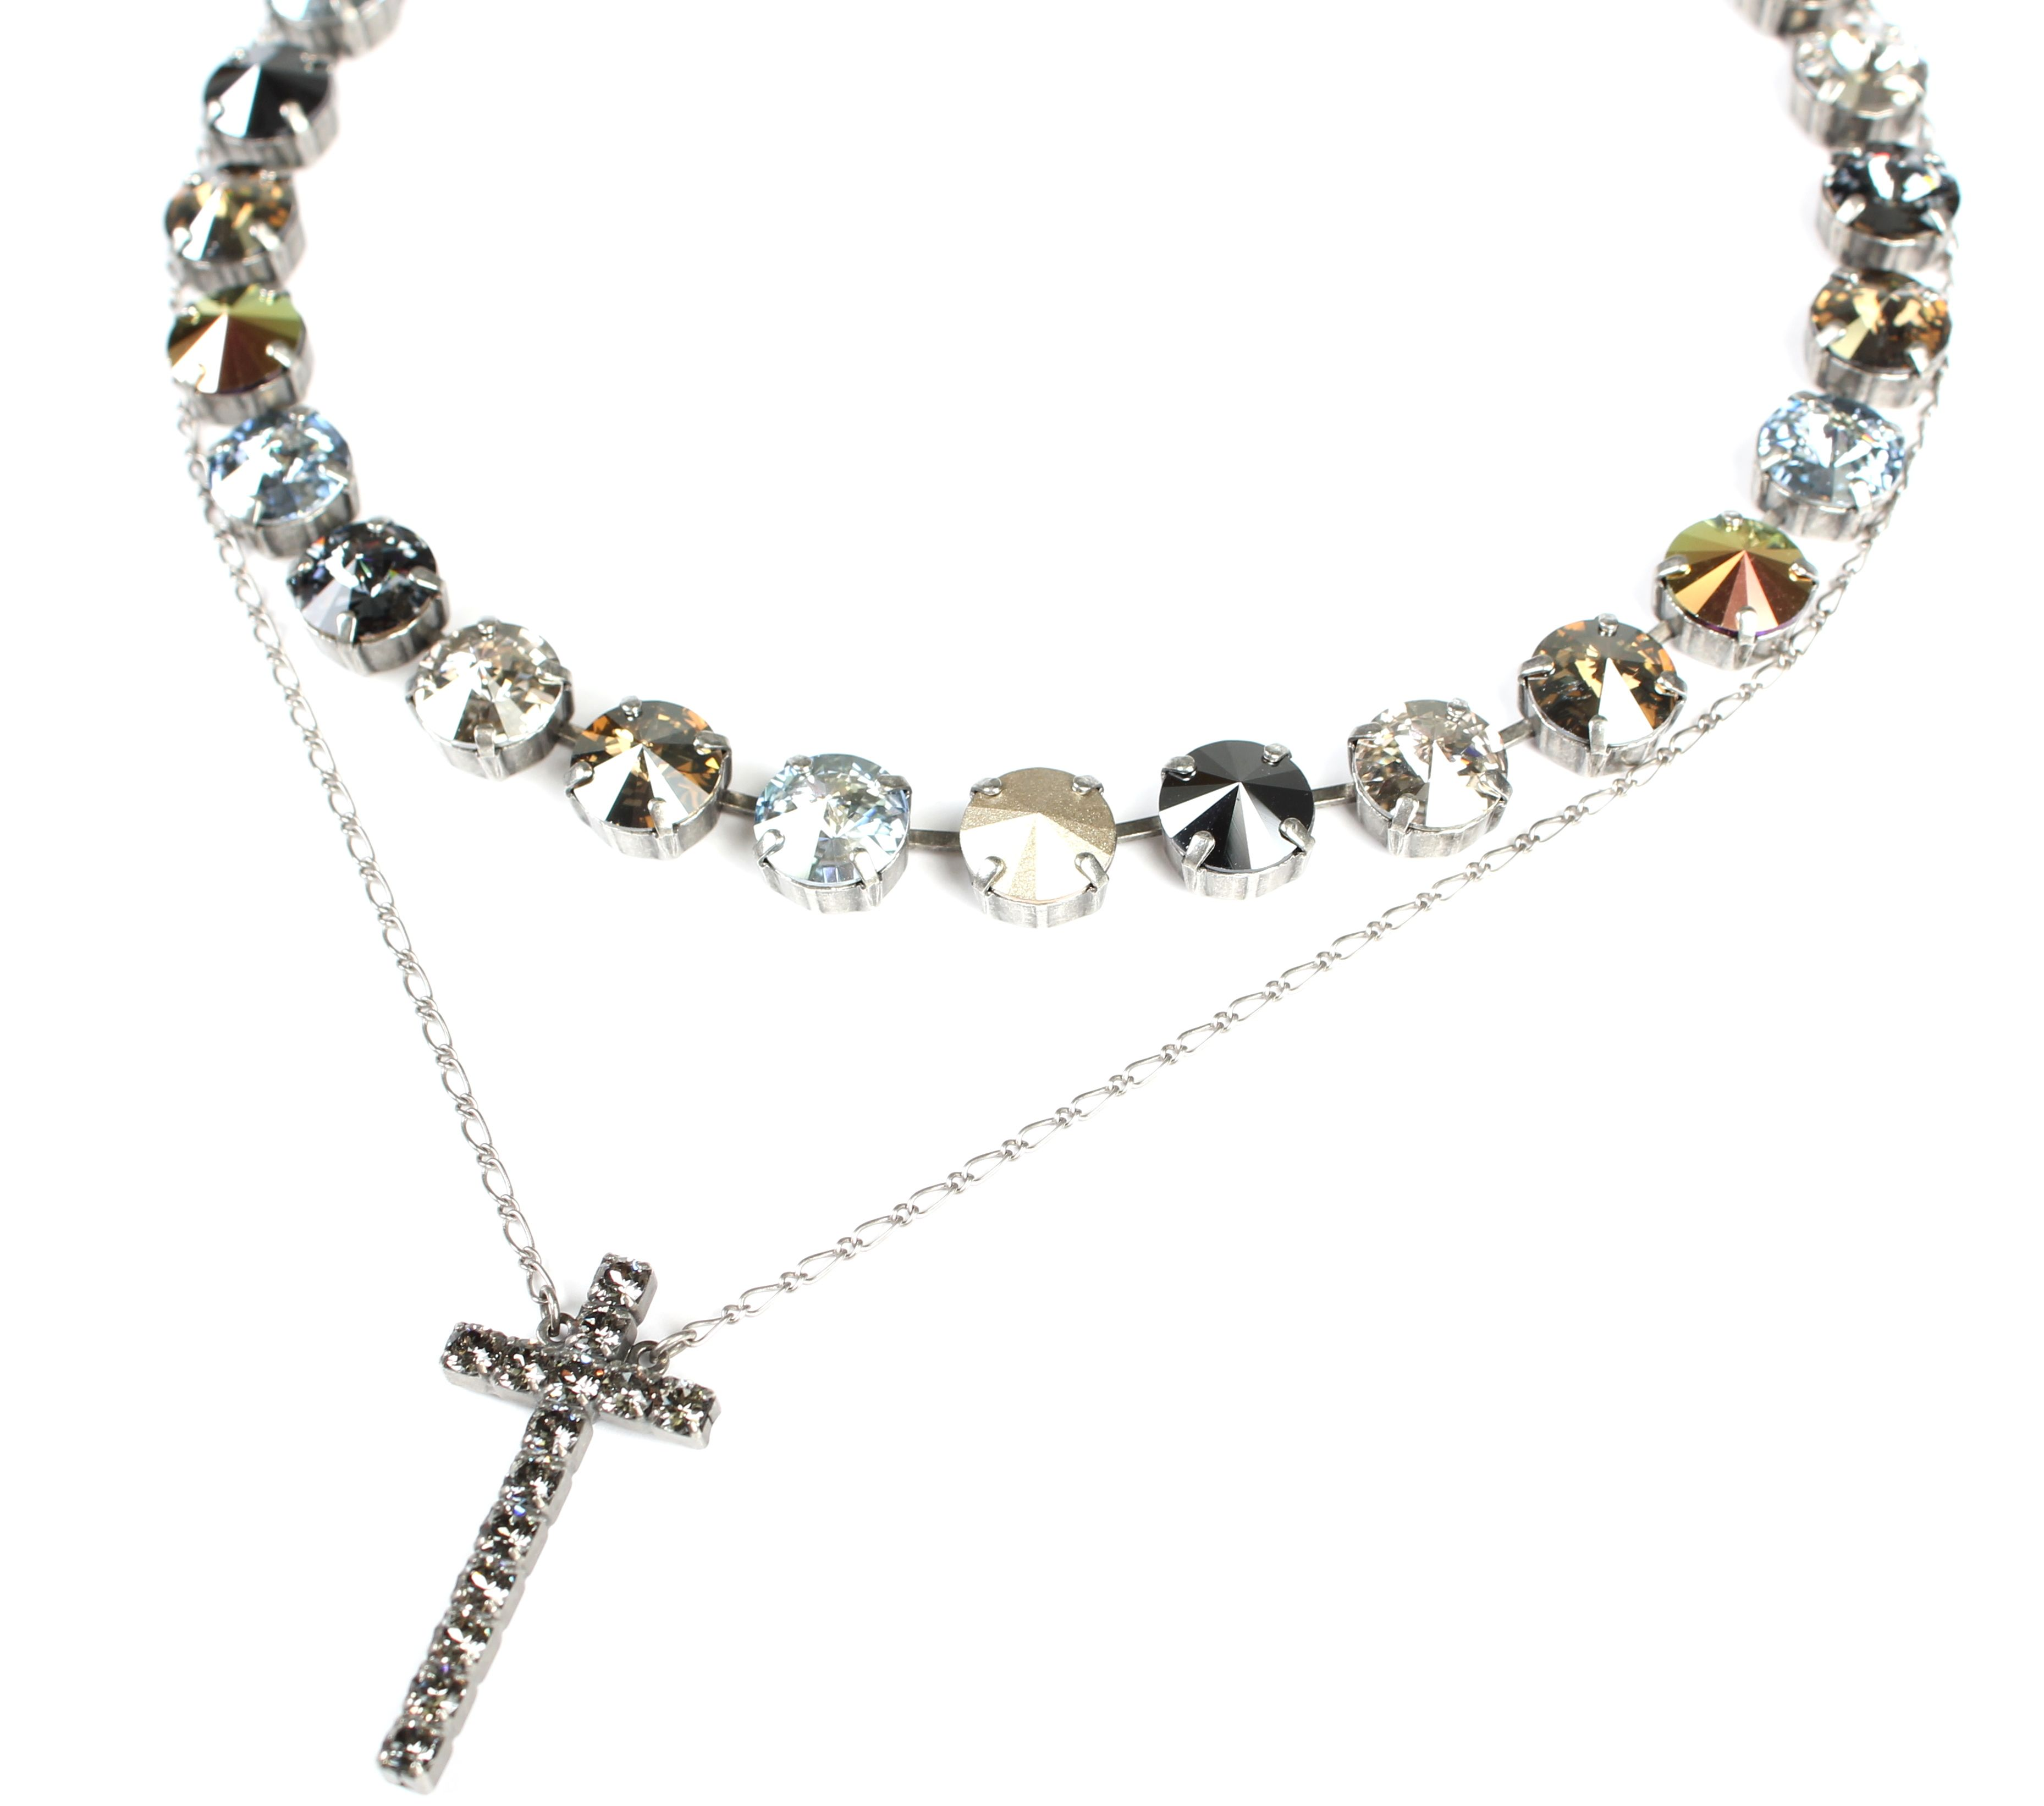 Sabika look necklace - Simple But Beautiful Edition Urban Classic Sabika Manhattan Tm Choker With Heritage Cross Necklace Contact